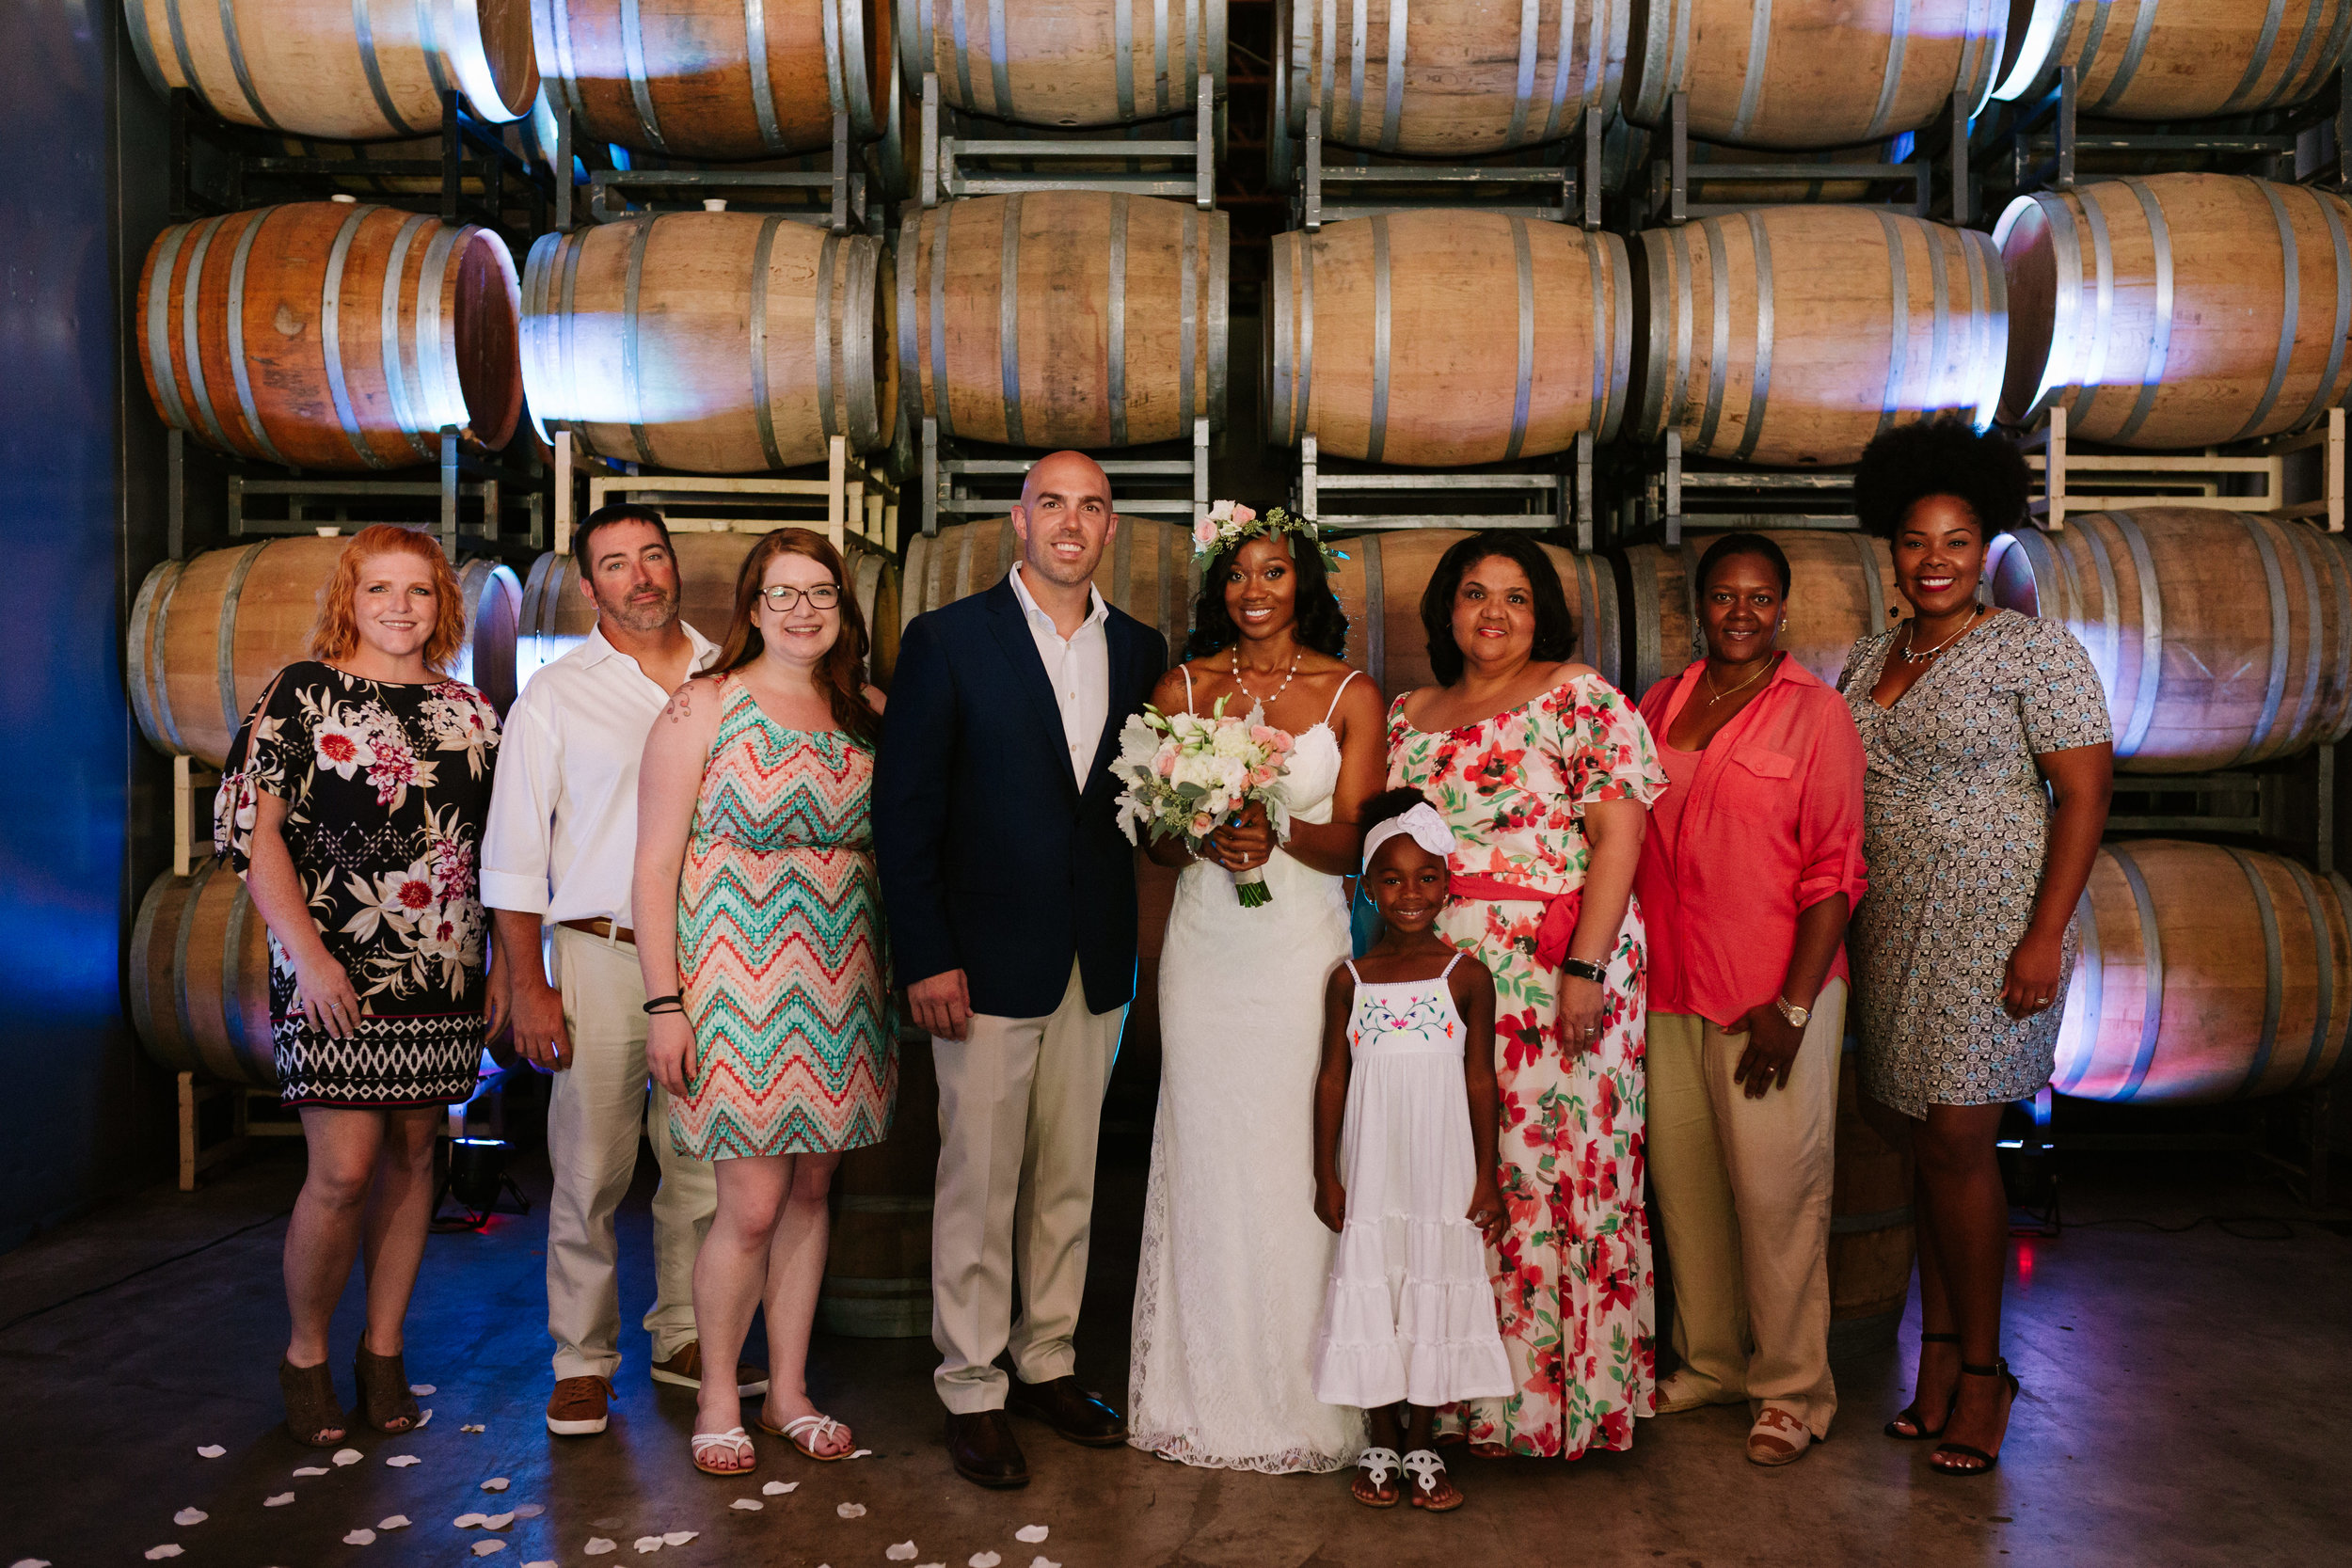 2017.09.16 Ashley and Chuck O'Day Quantam Leap Winery Wedding (206 of 462).jpg